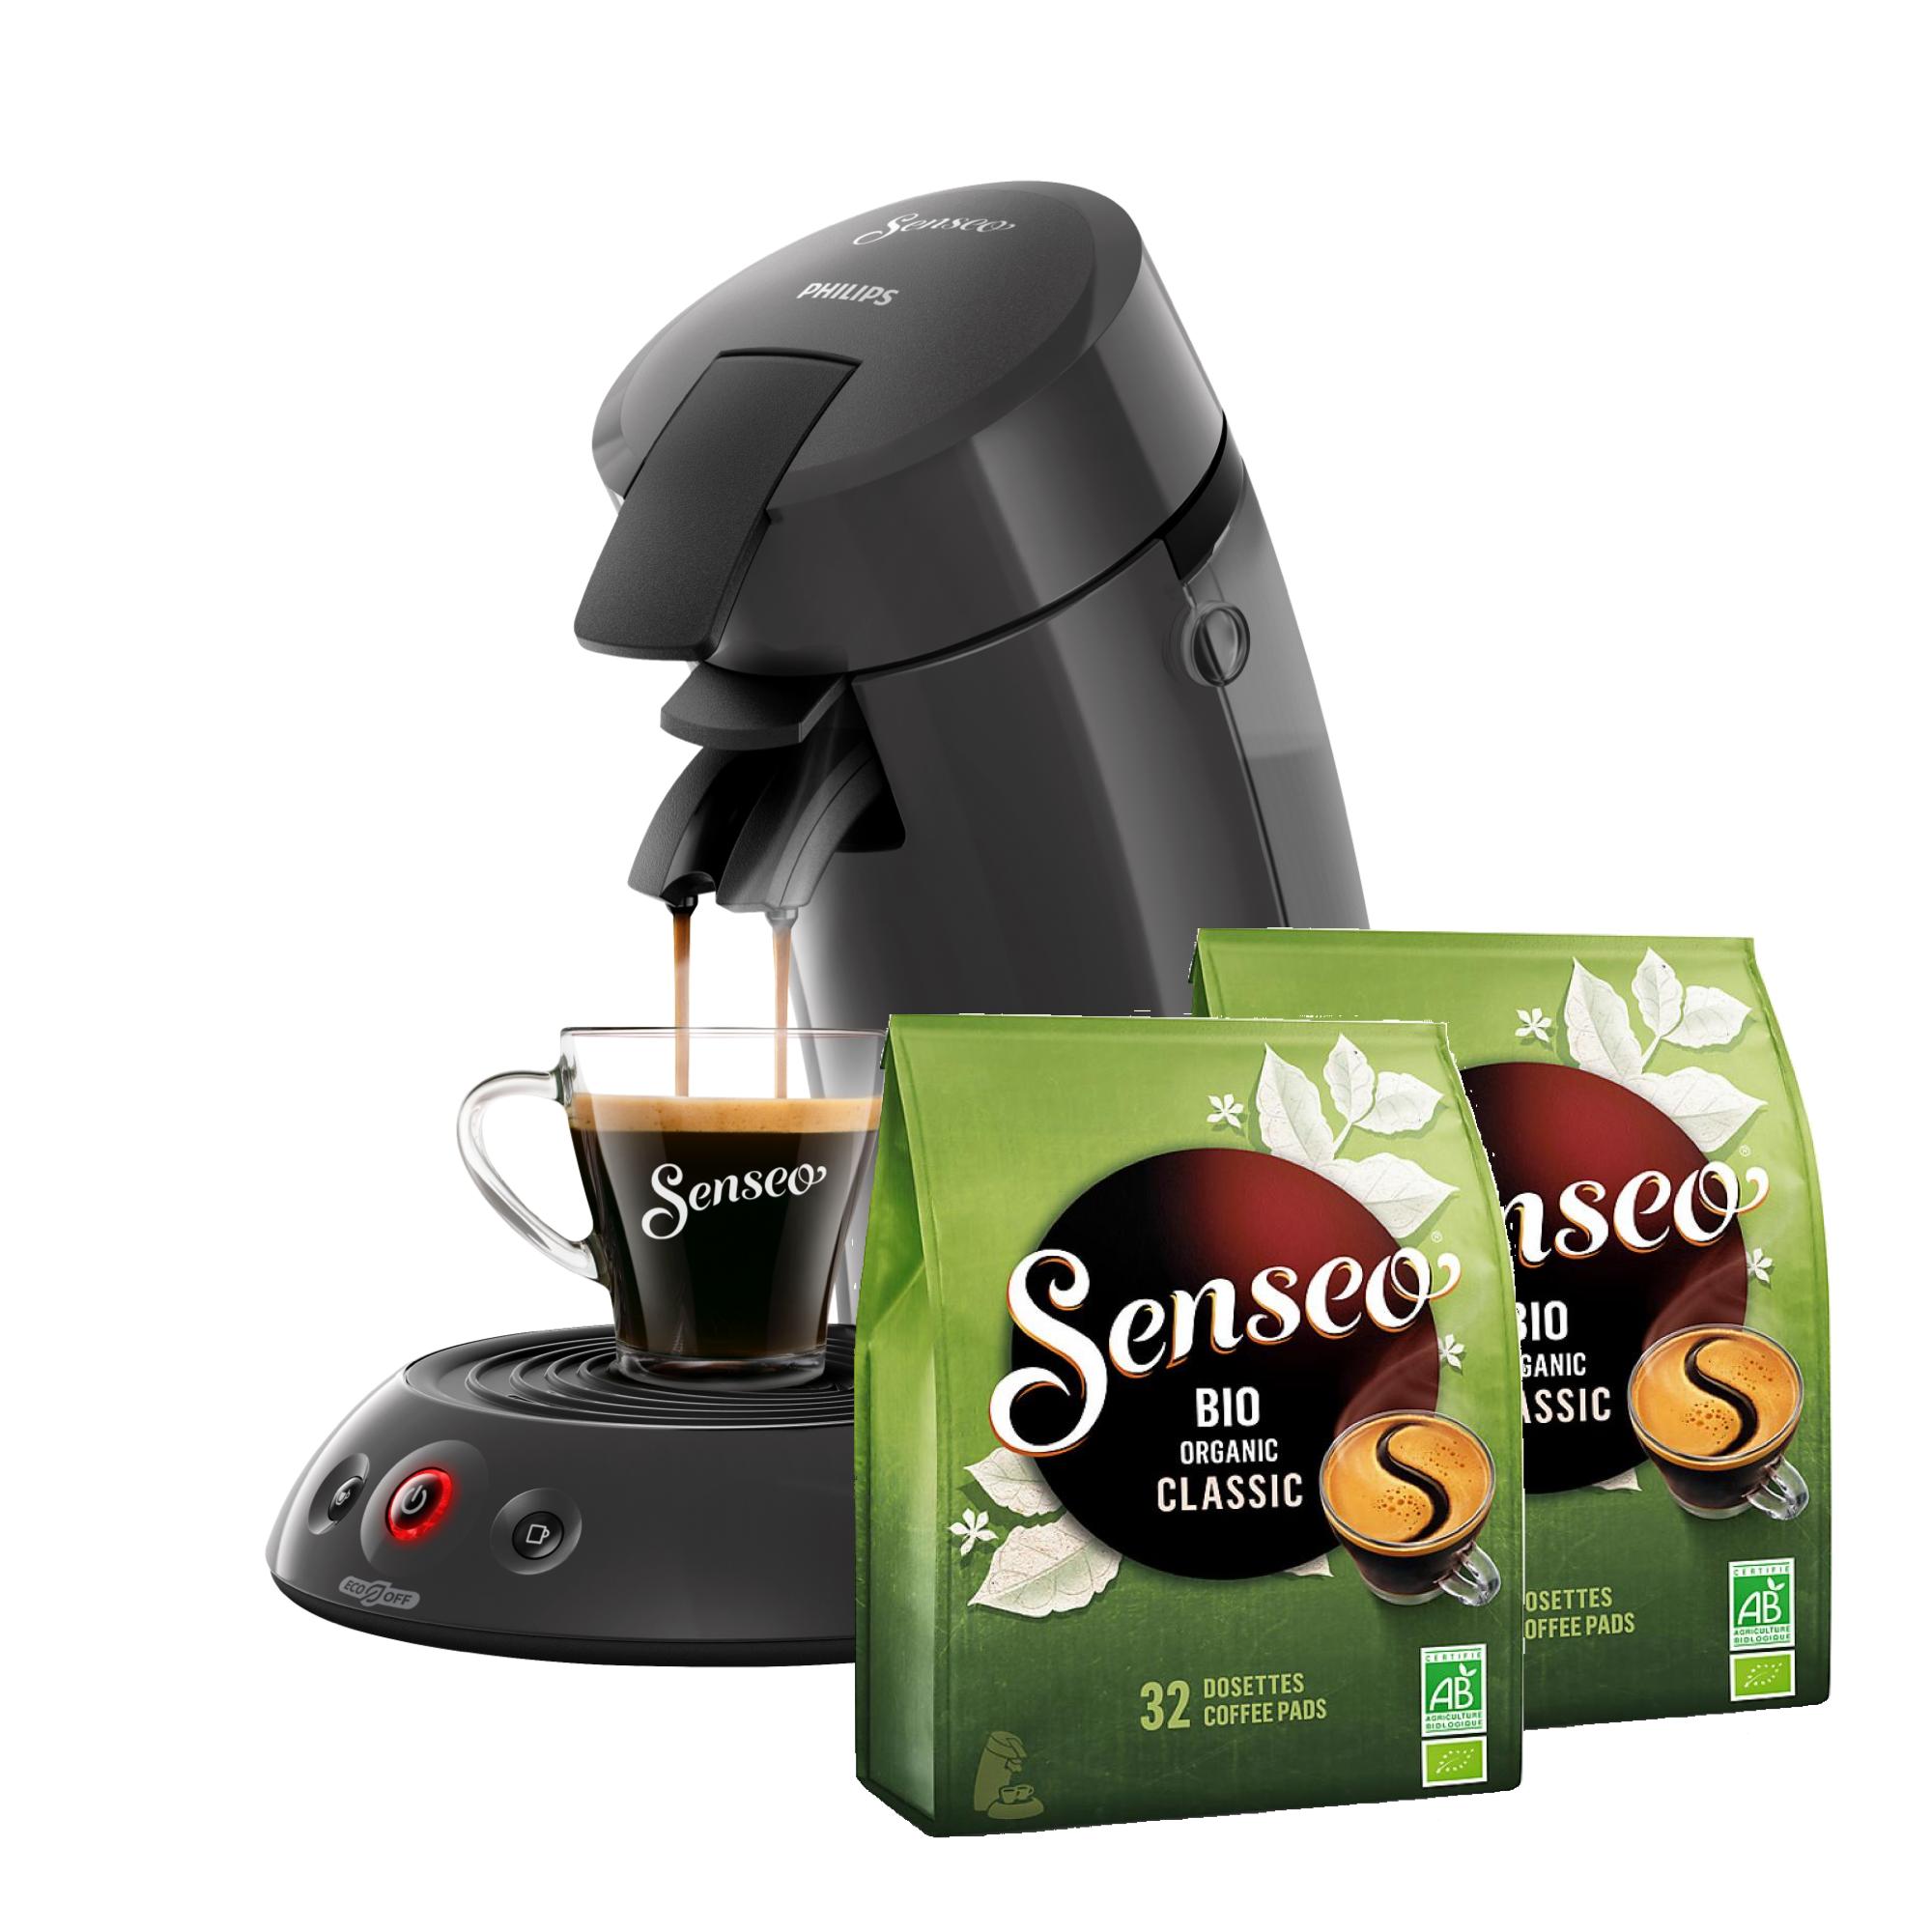 Senseo - Original Eco Startkit